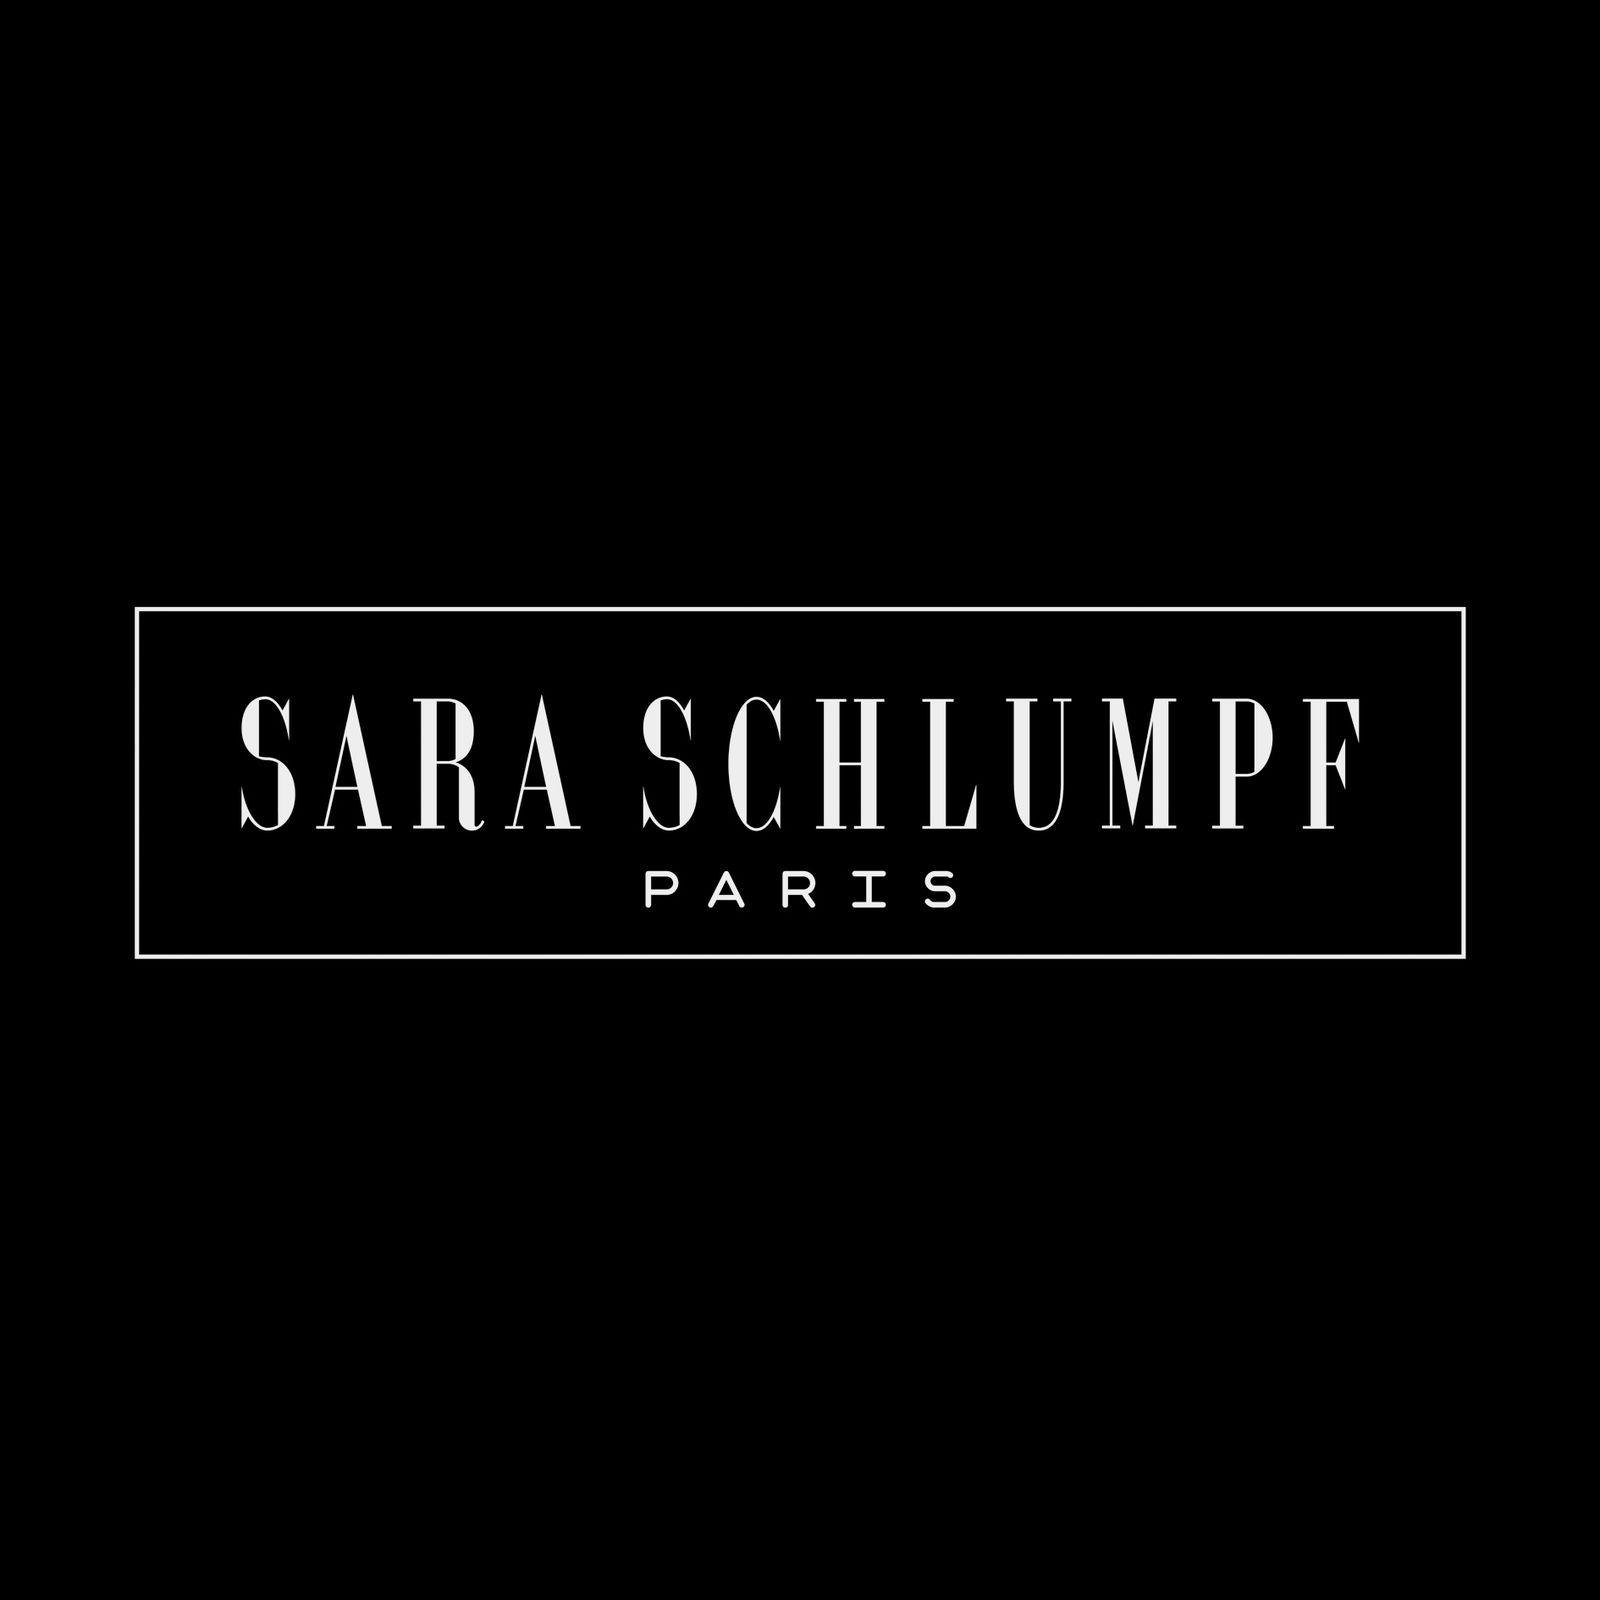 SARA SCHLUMPF Haute Couture